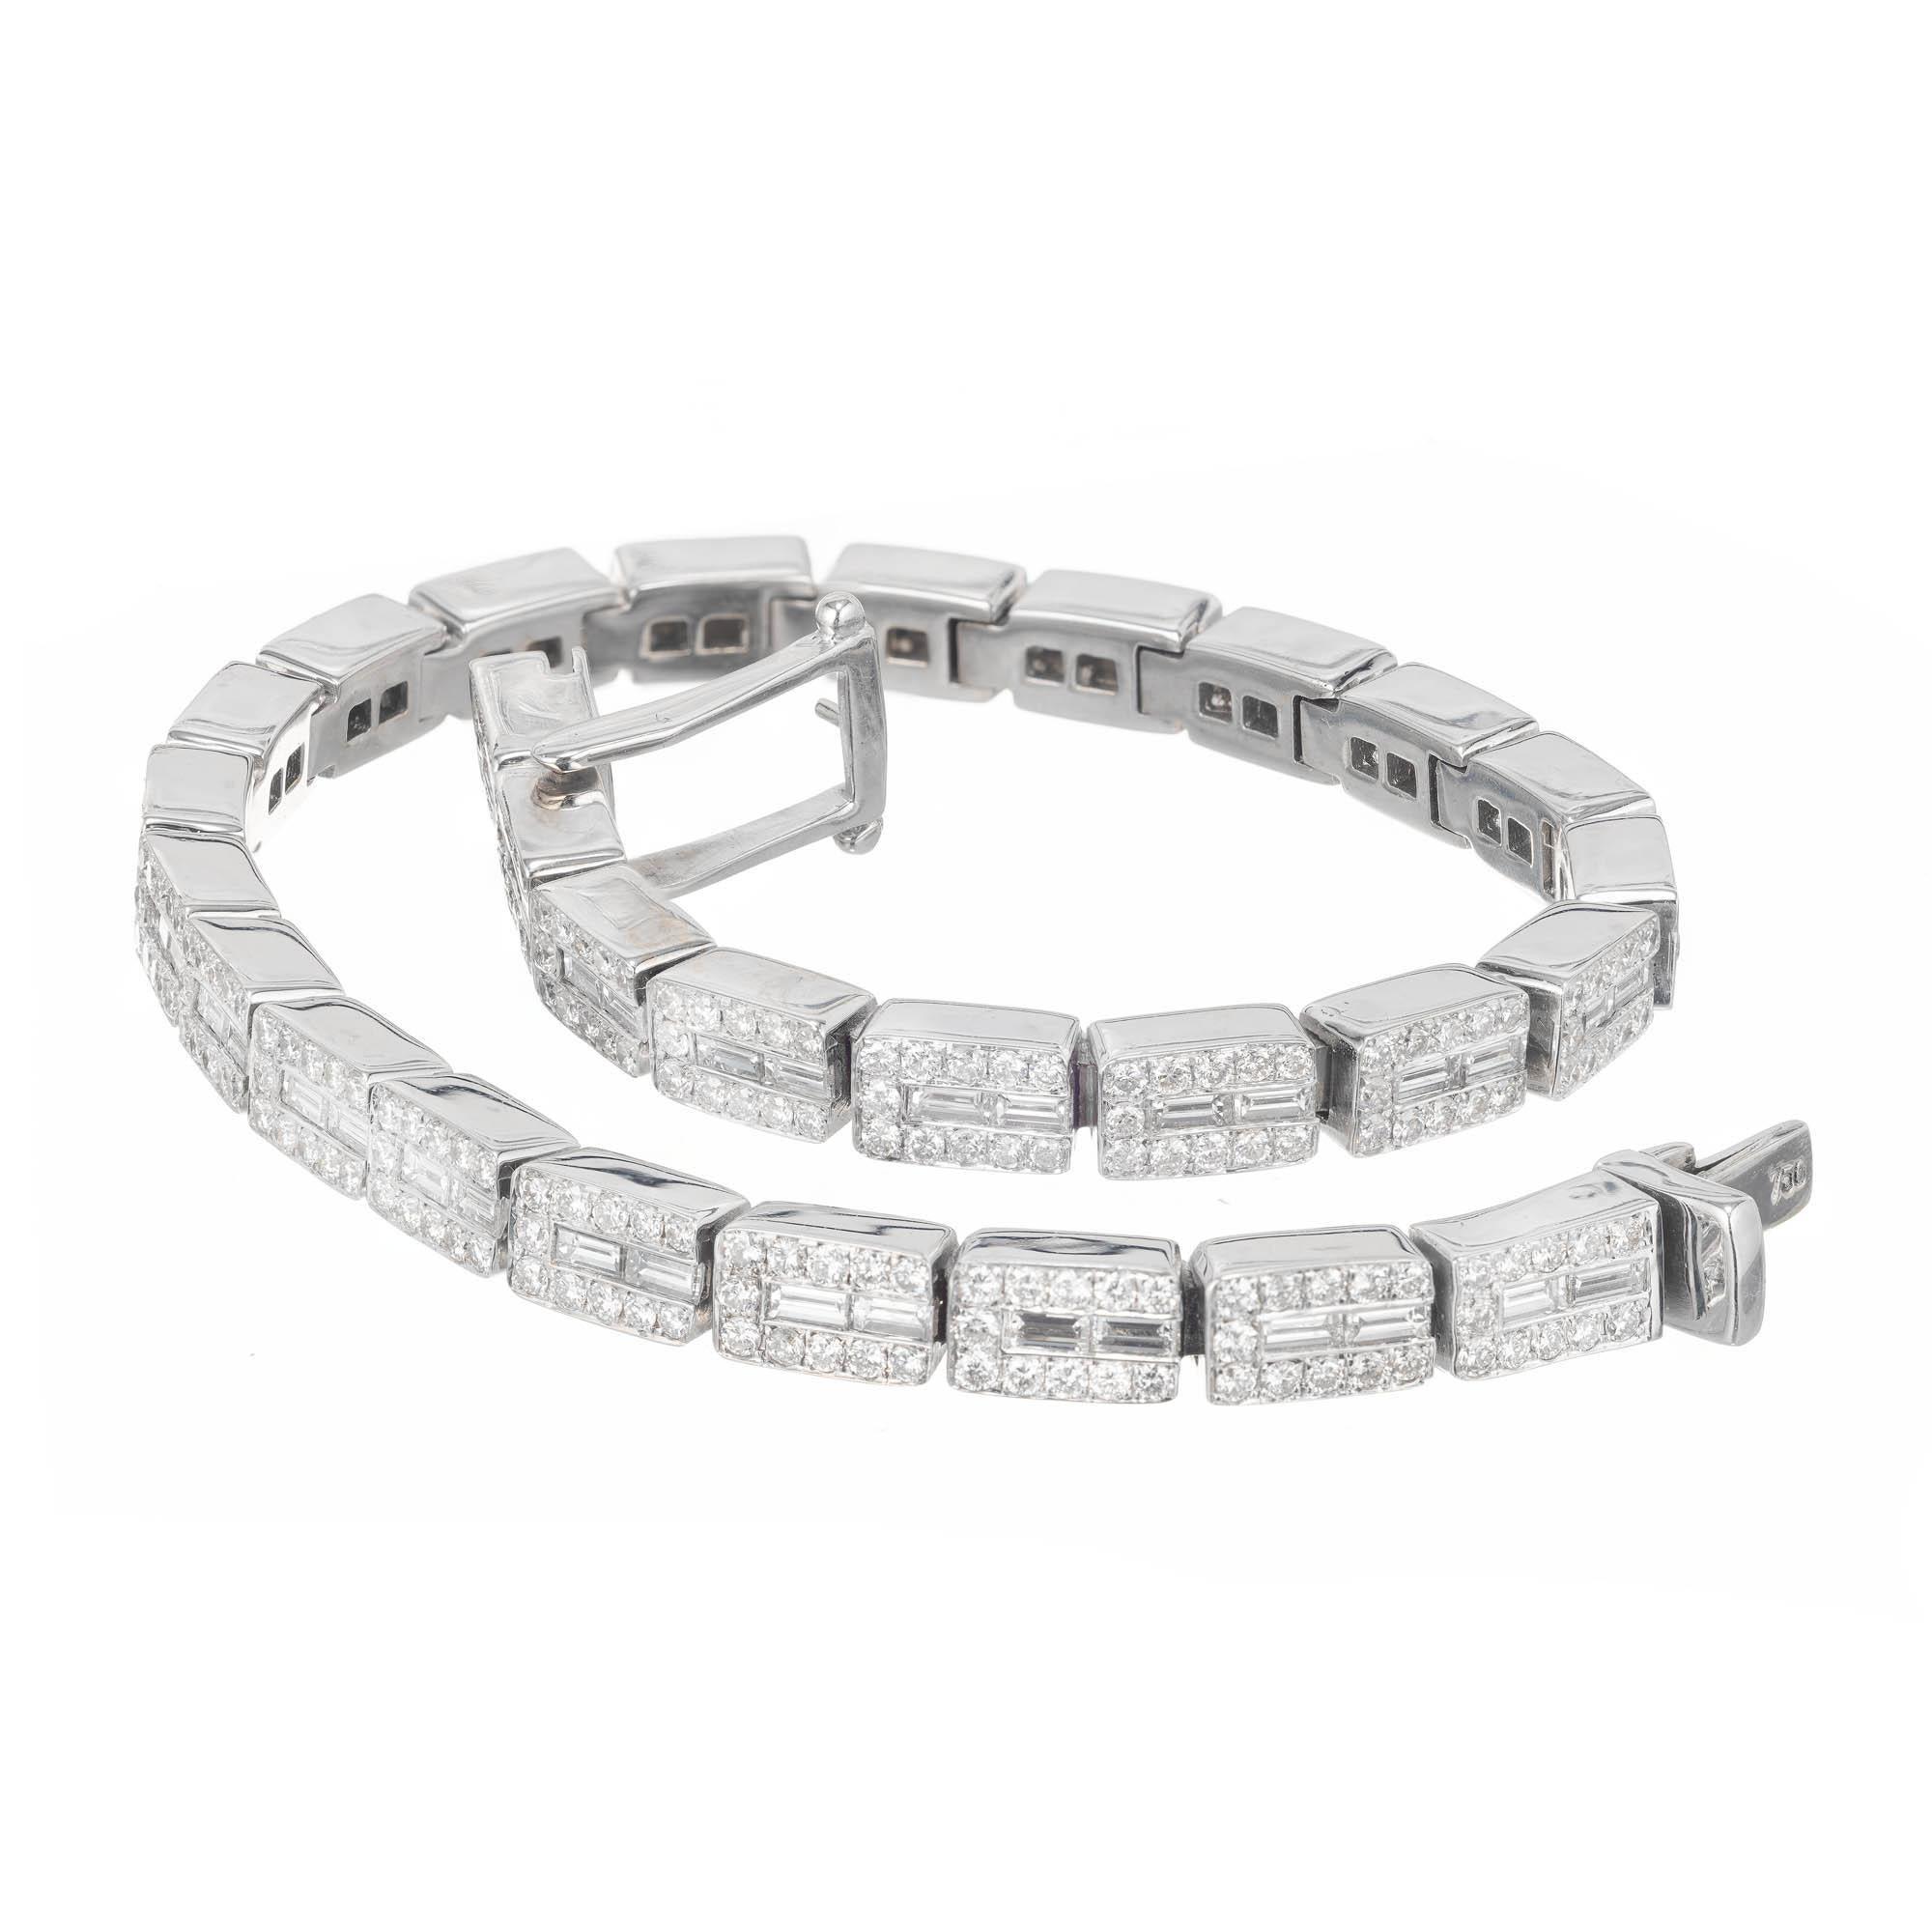 4.25 Carat Baguette Round Diamond White Gold Link Bracelet